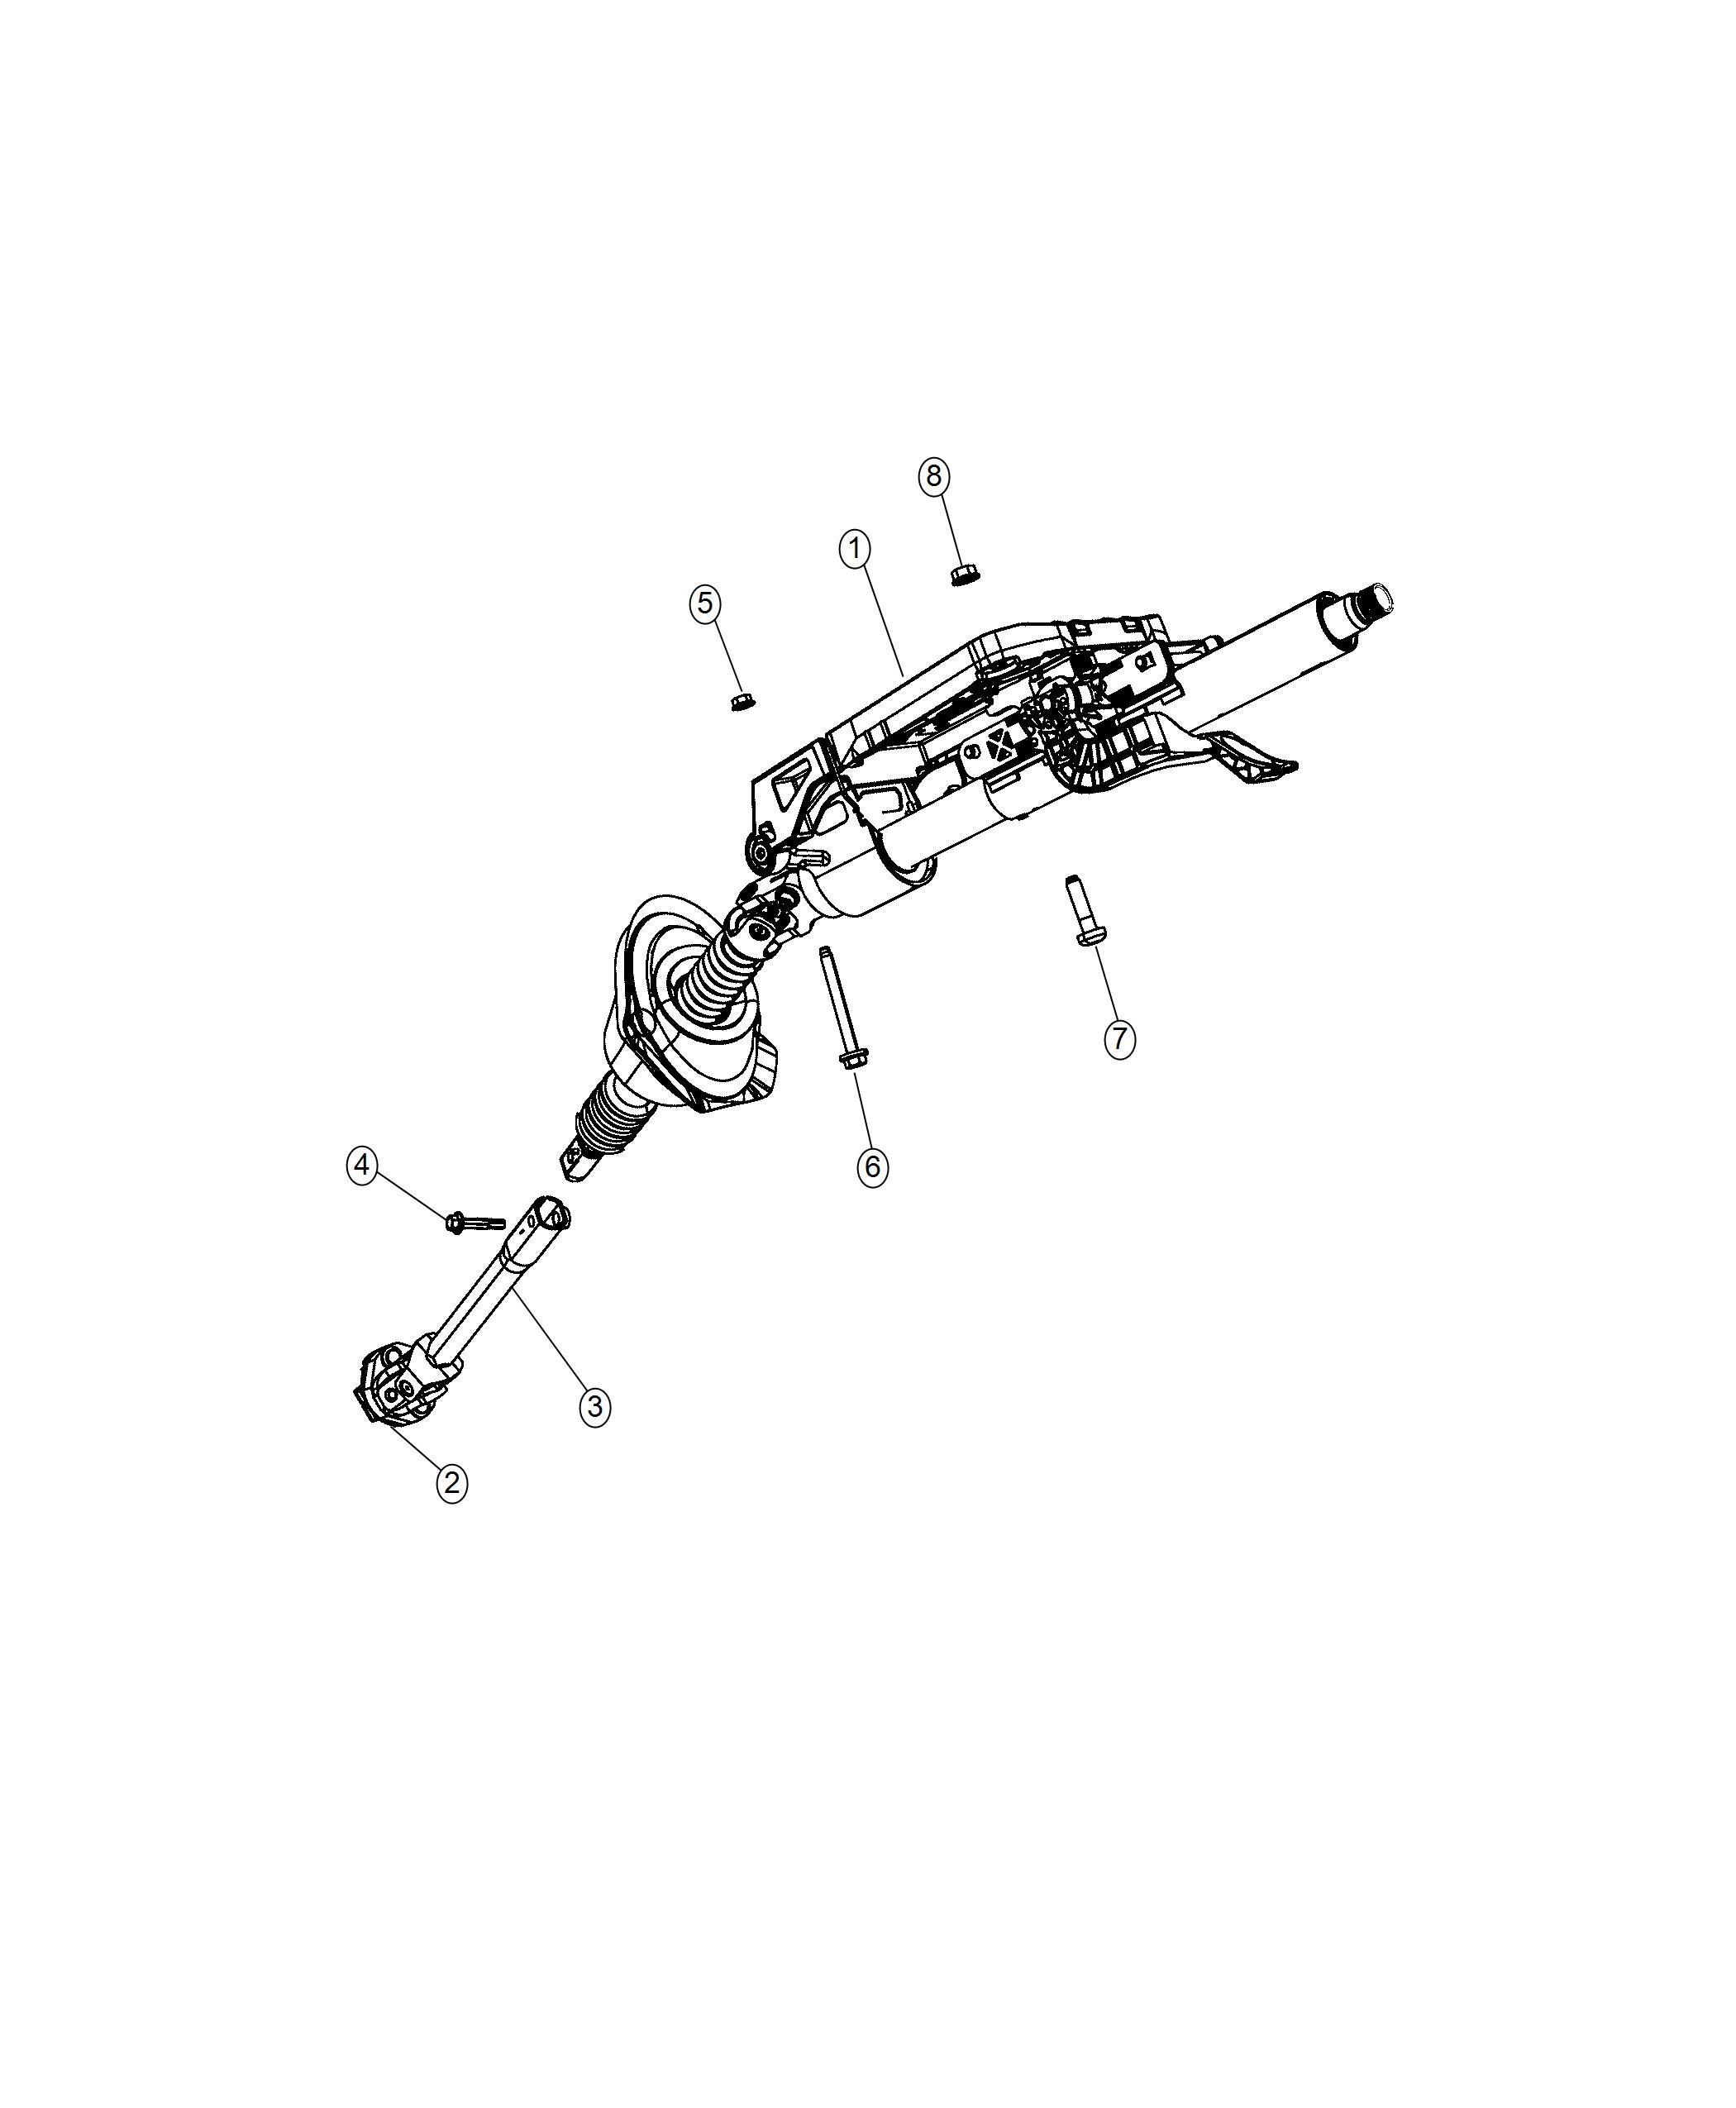 Dodge Charger Column Steering Instrument Panel Parts